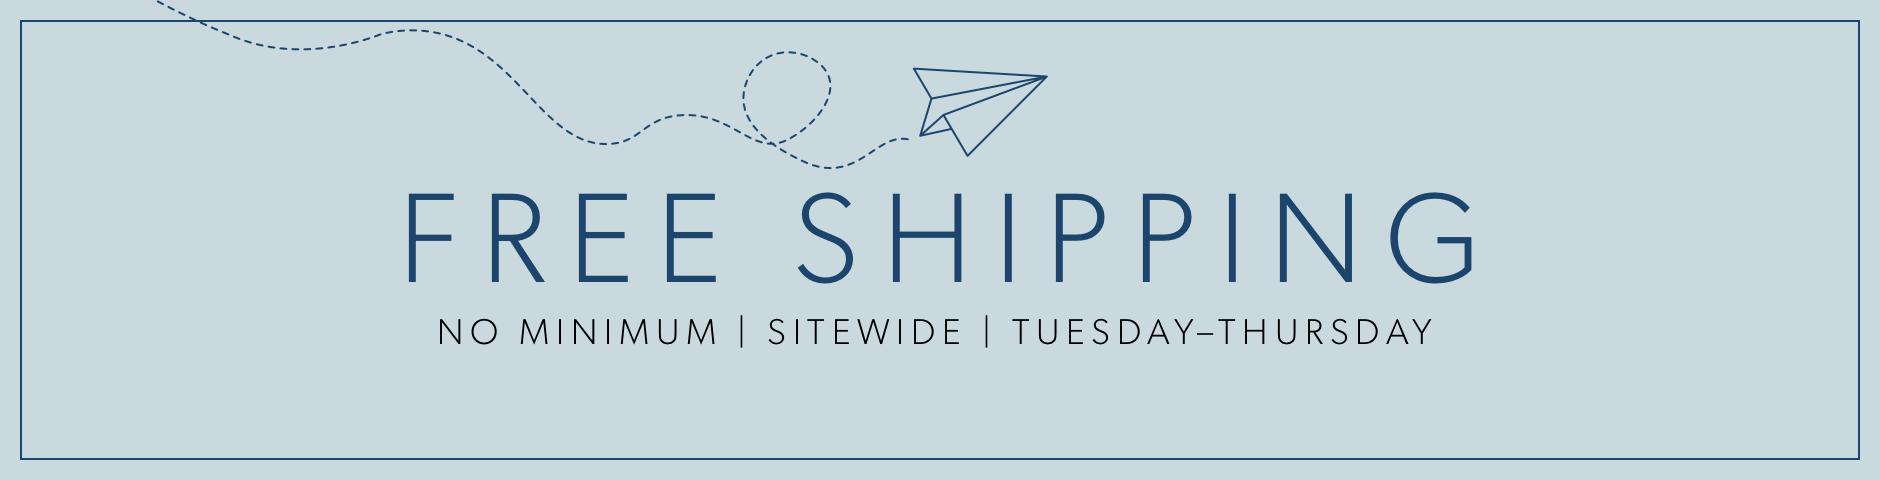 0359e442f Free Shipping No Minimum - May 21 - 23